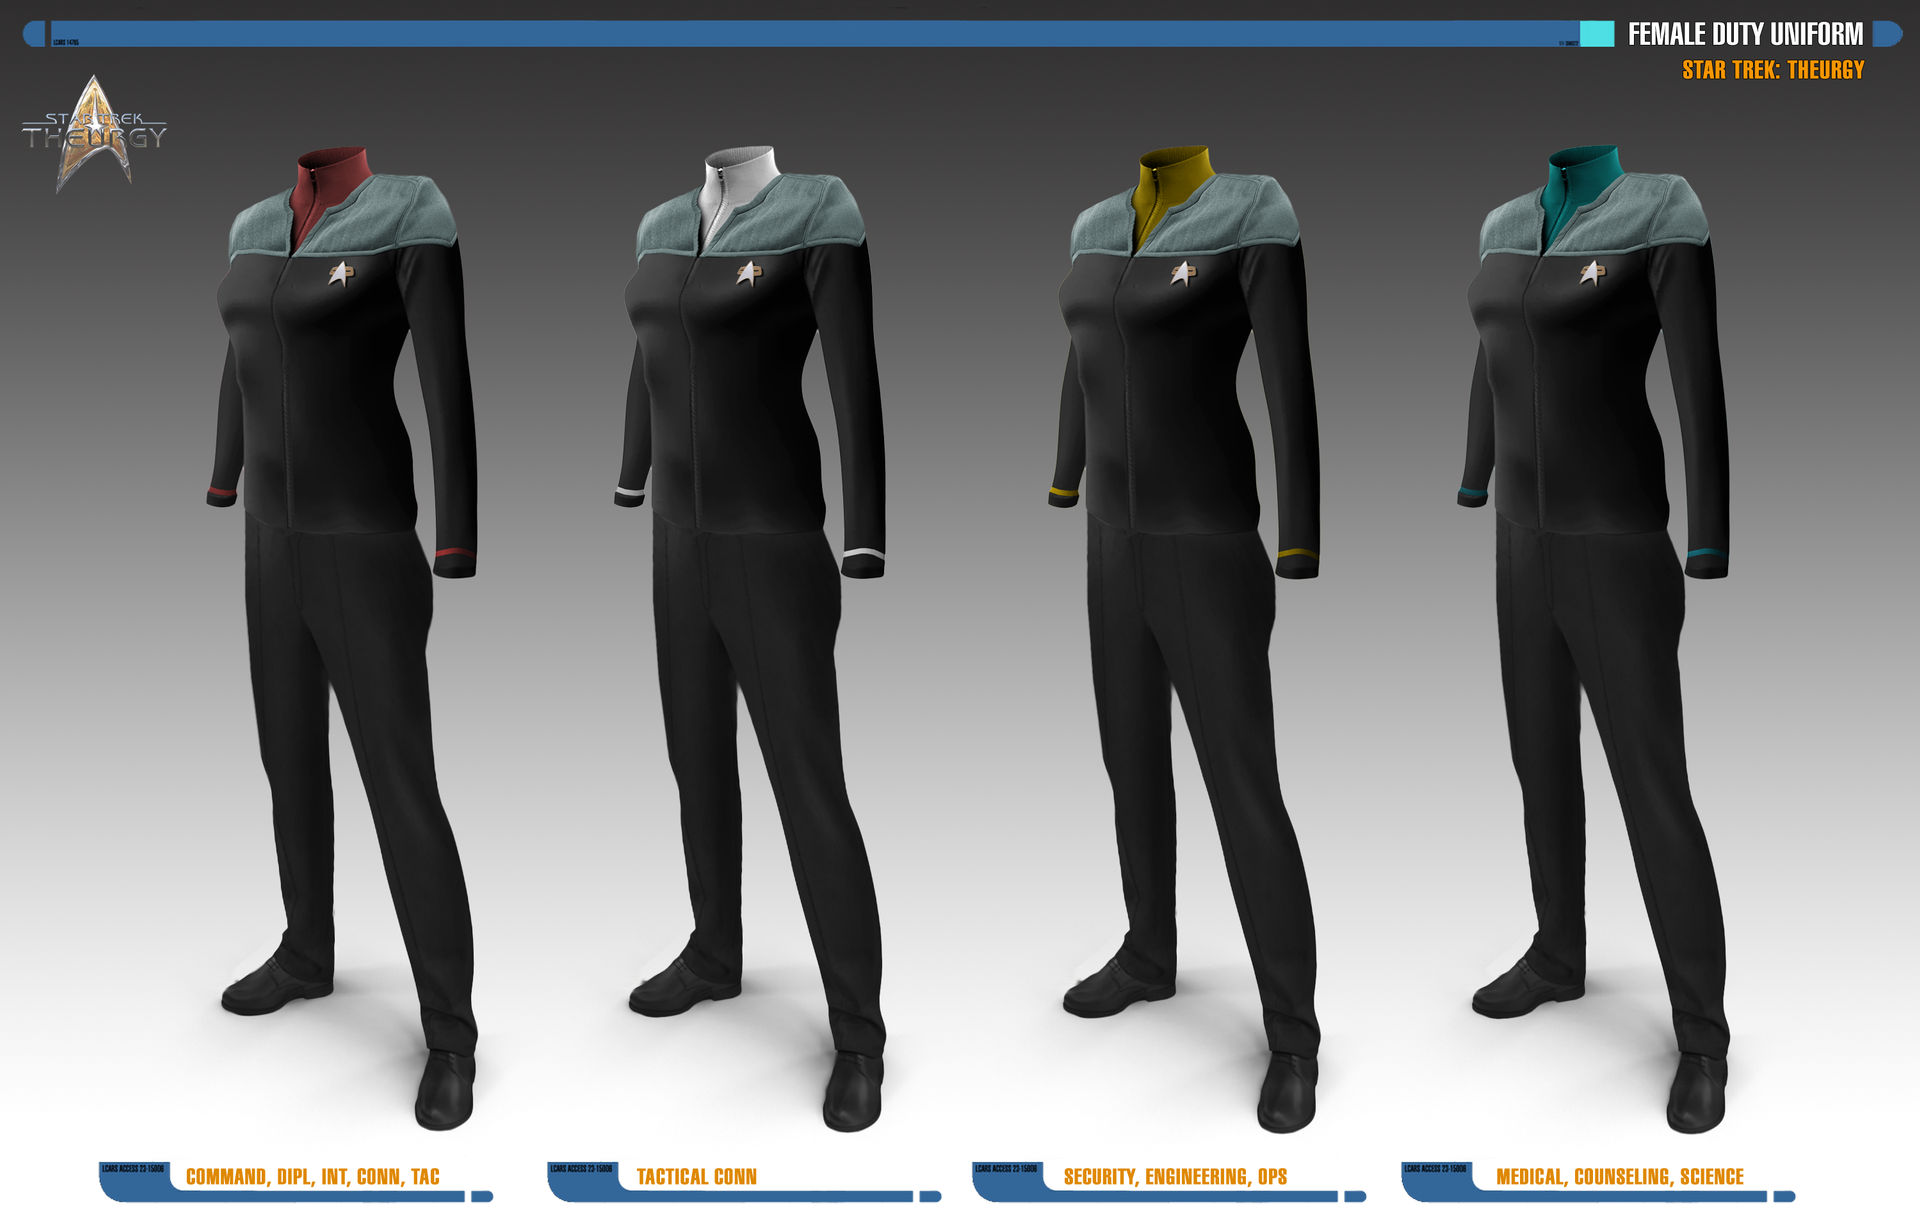 Female Duty Uniforms | Star Trek: Theurgy